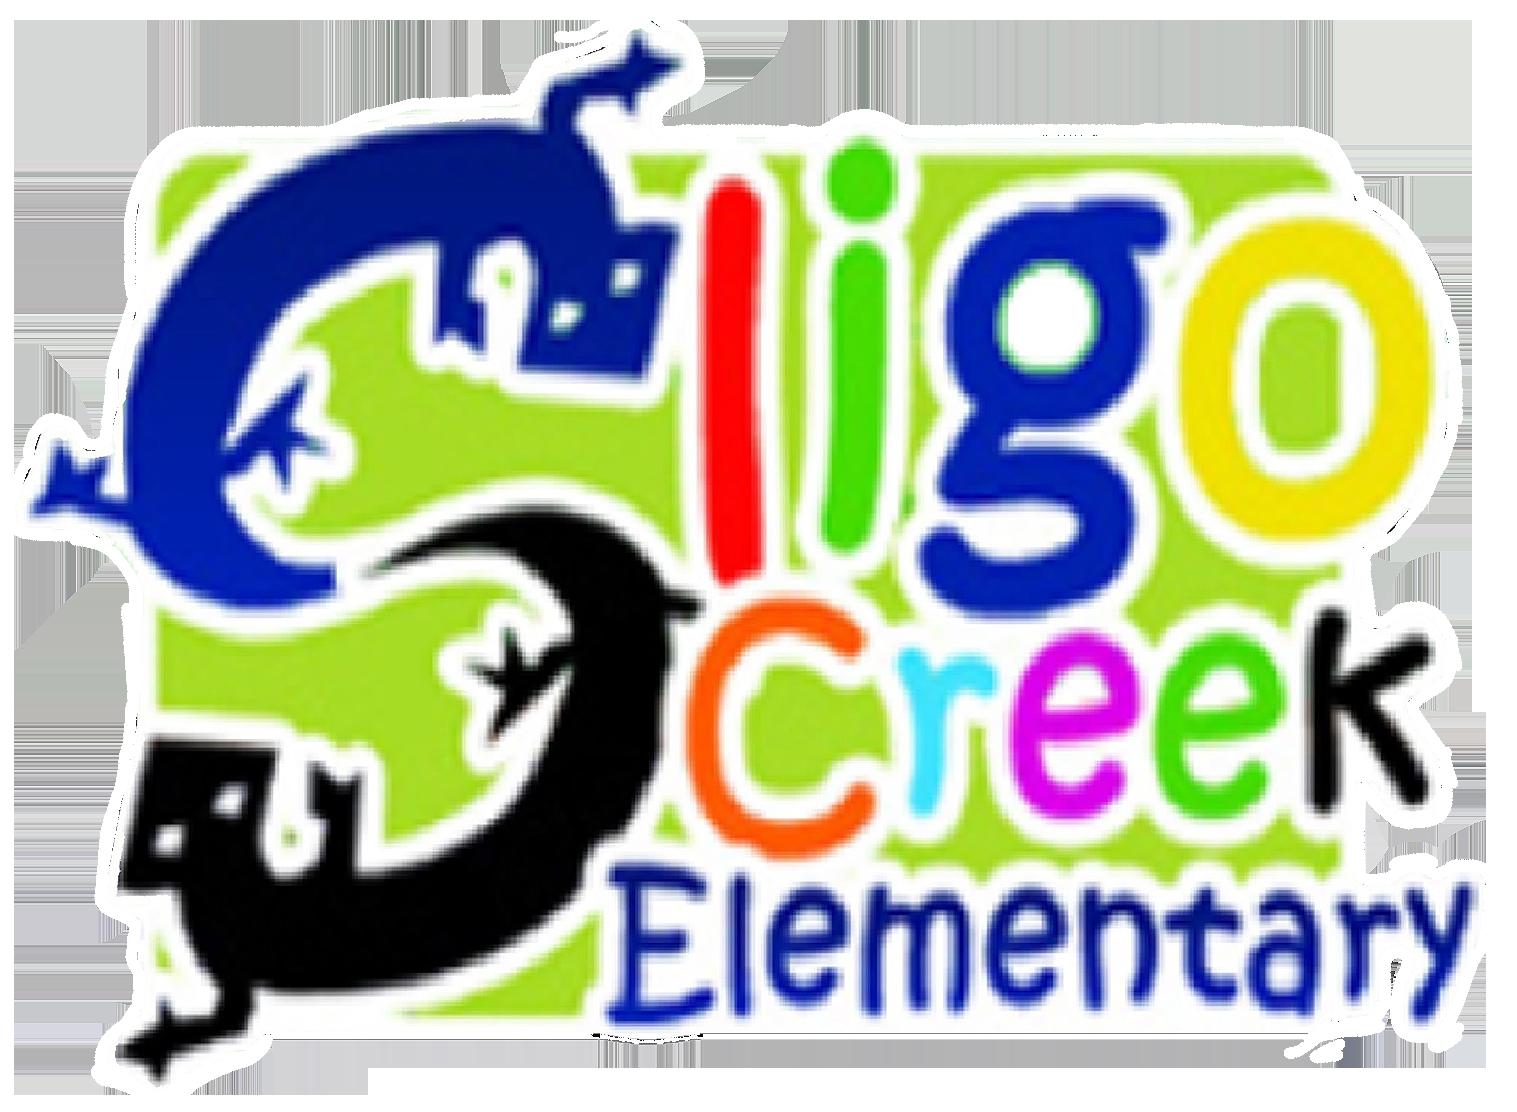 Sligo Creek Elementary School logo